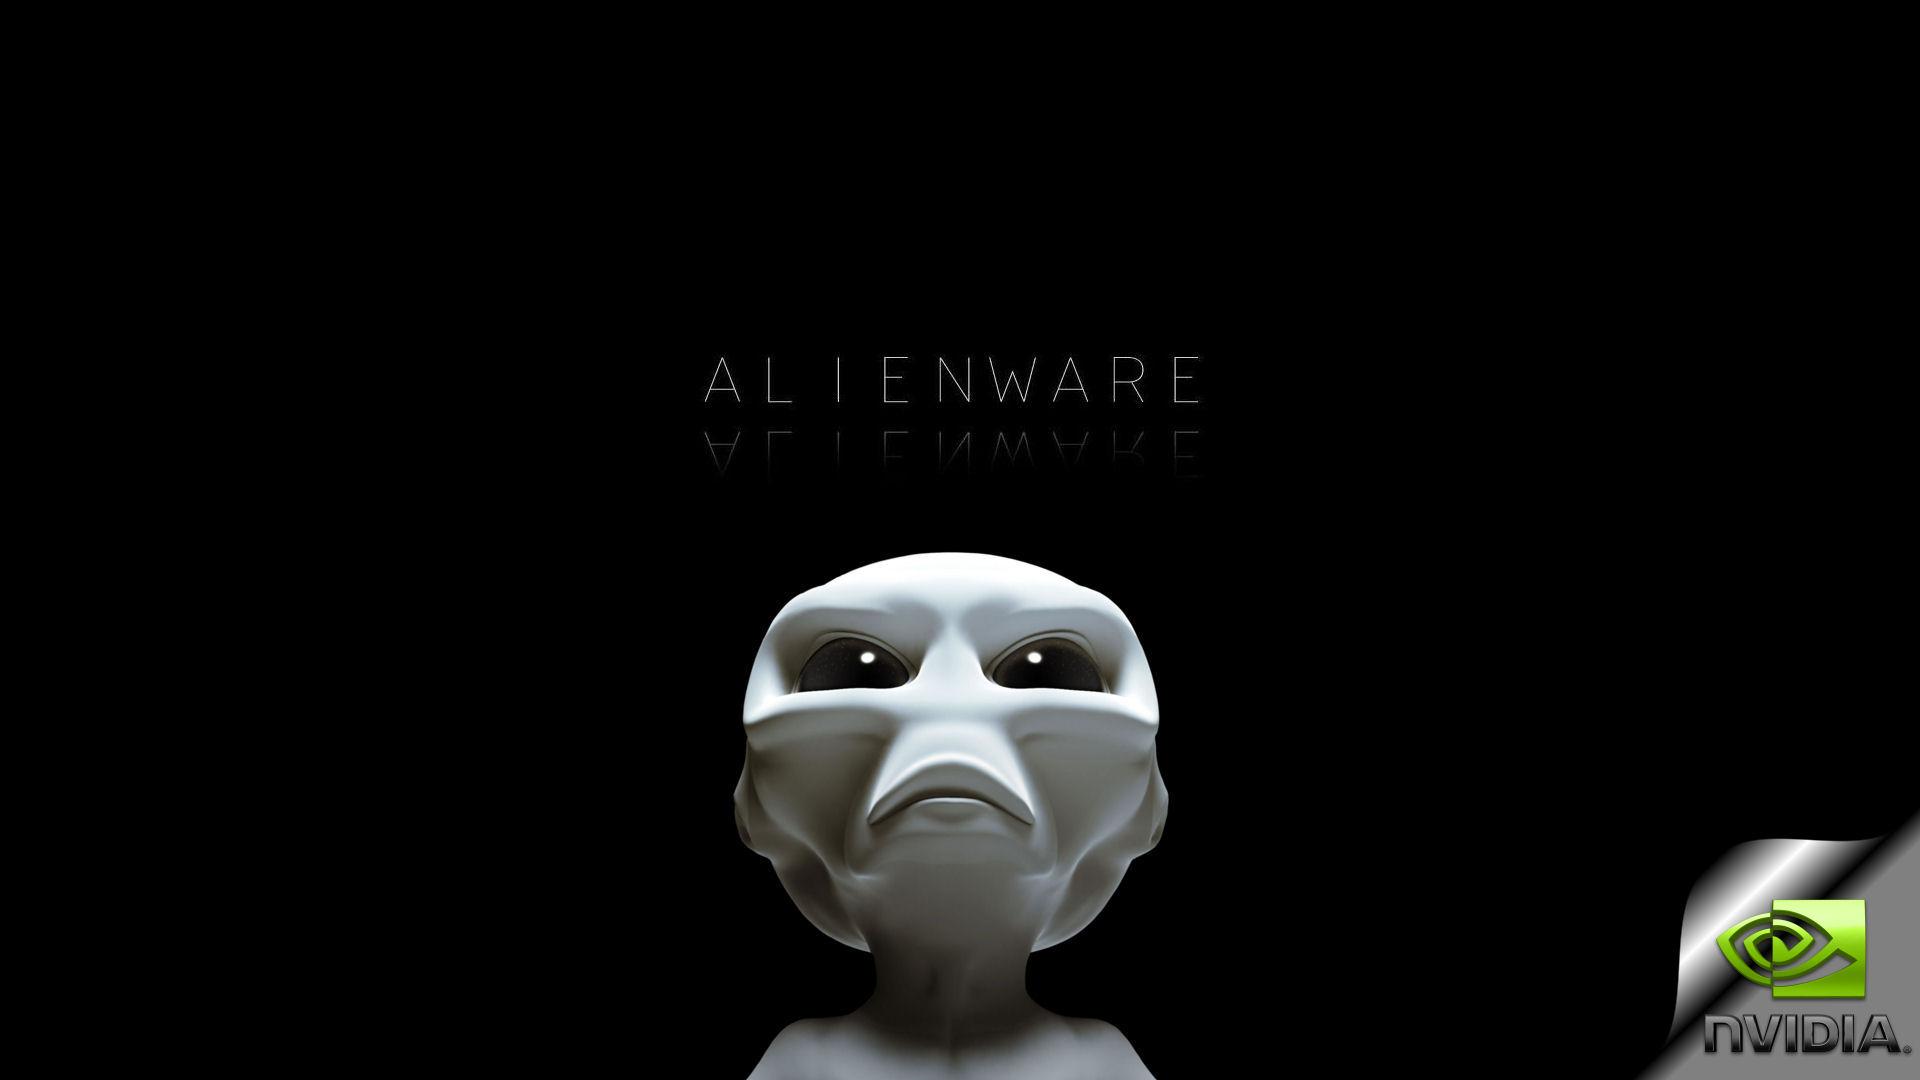 alienware hd new breed nvidiablackcelica on deviantart